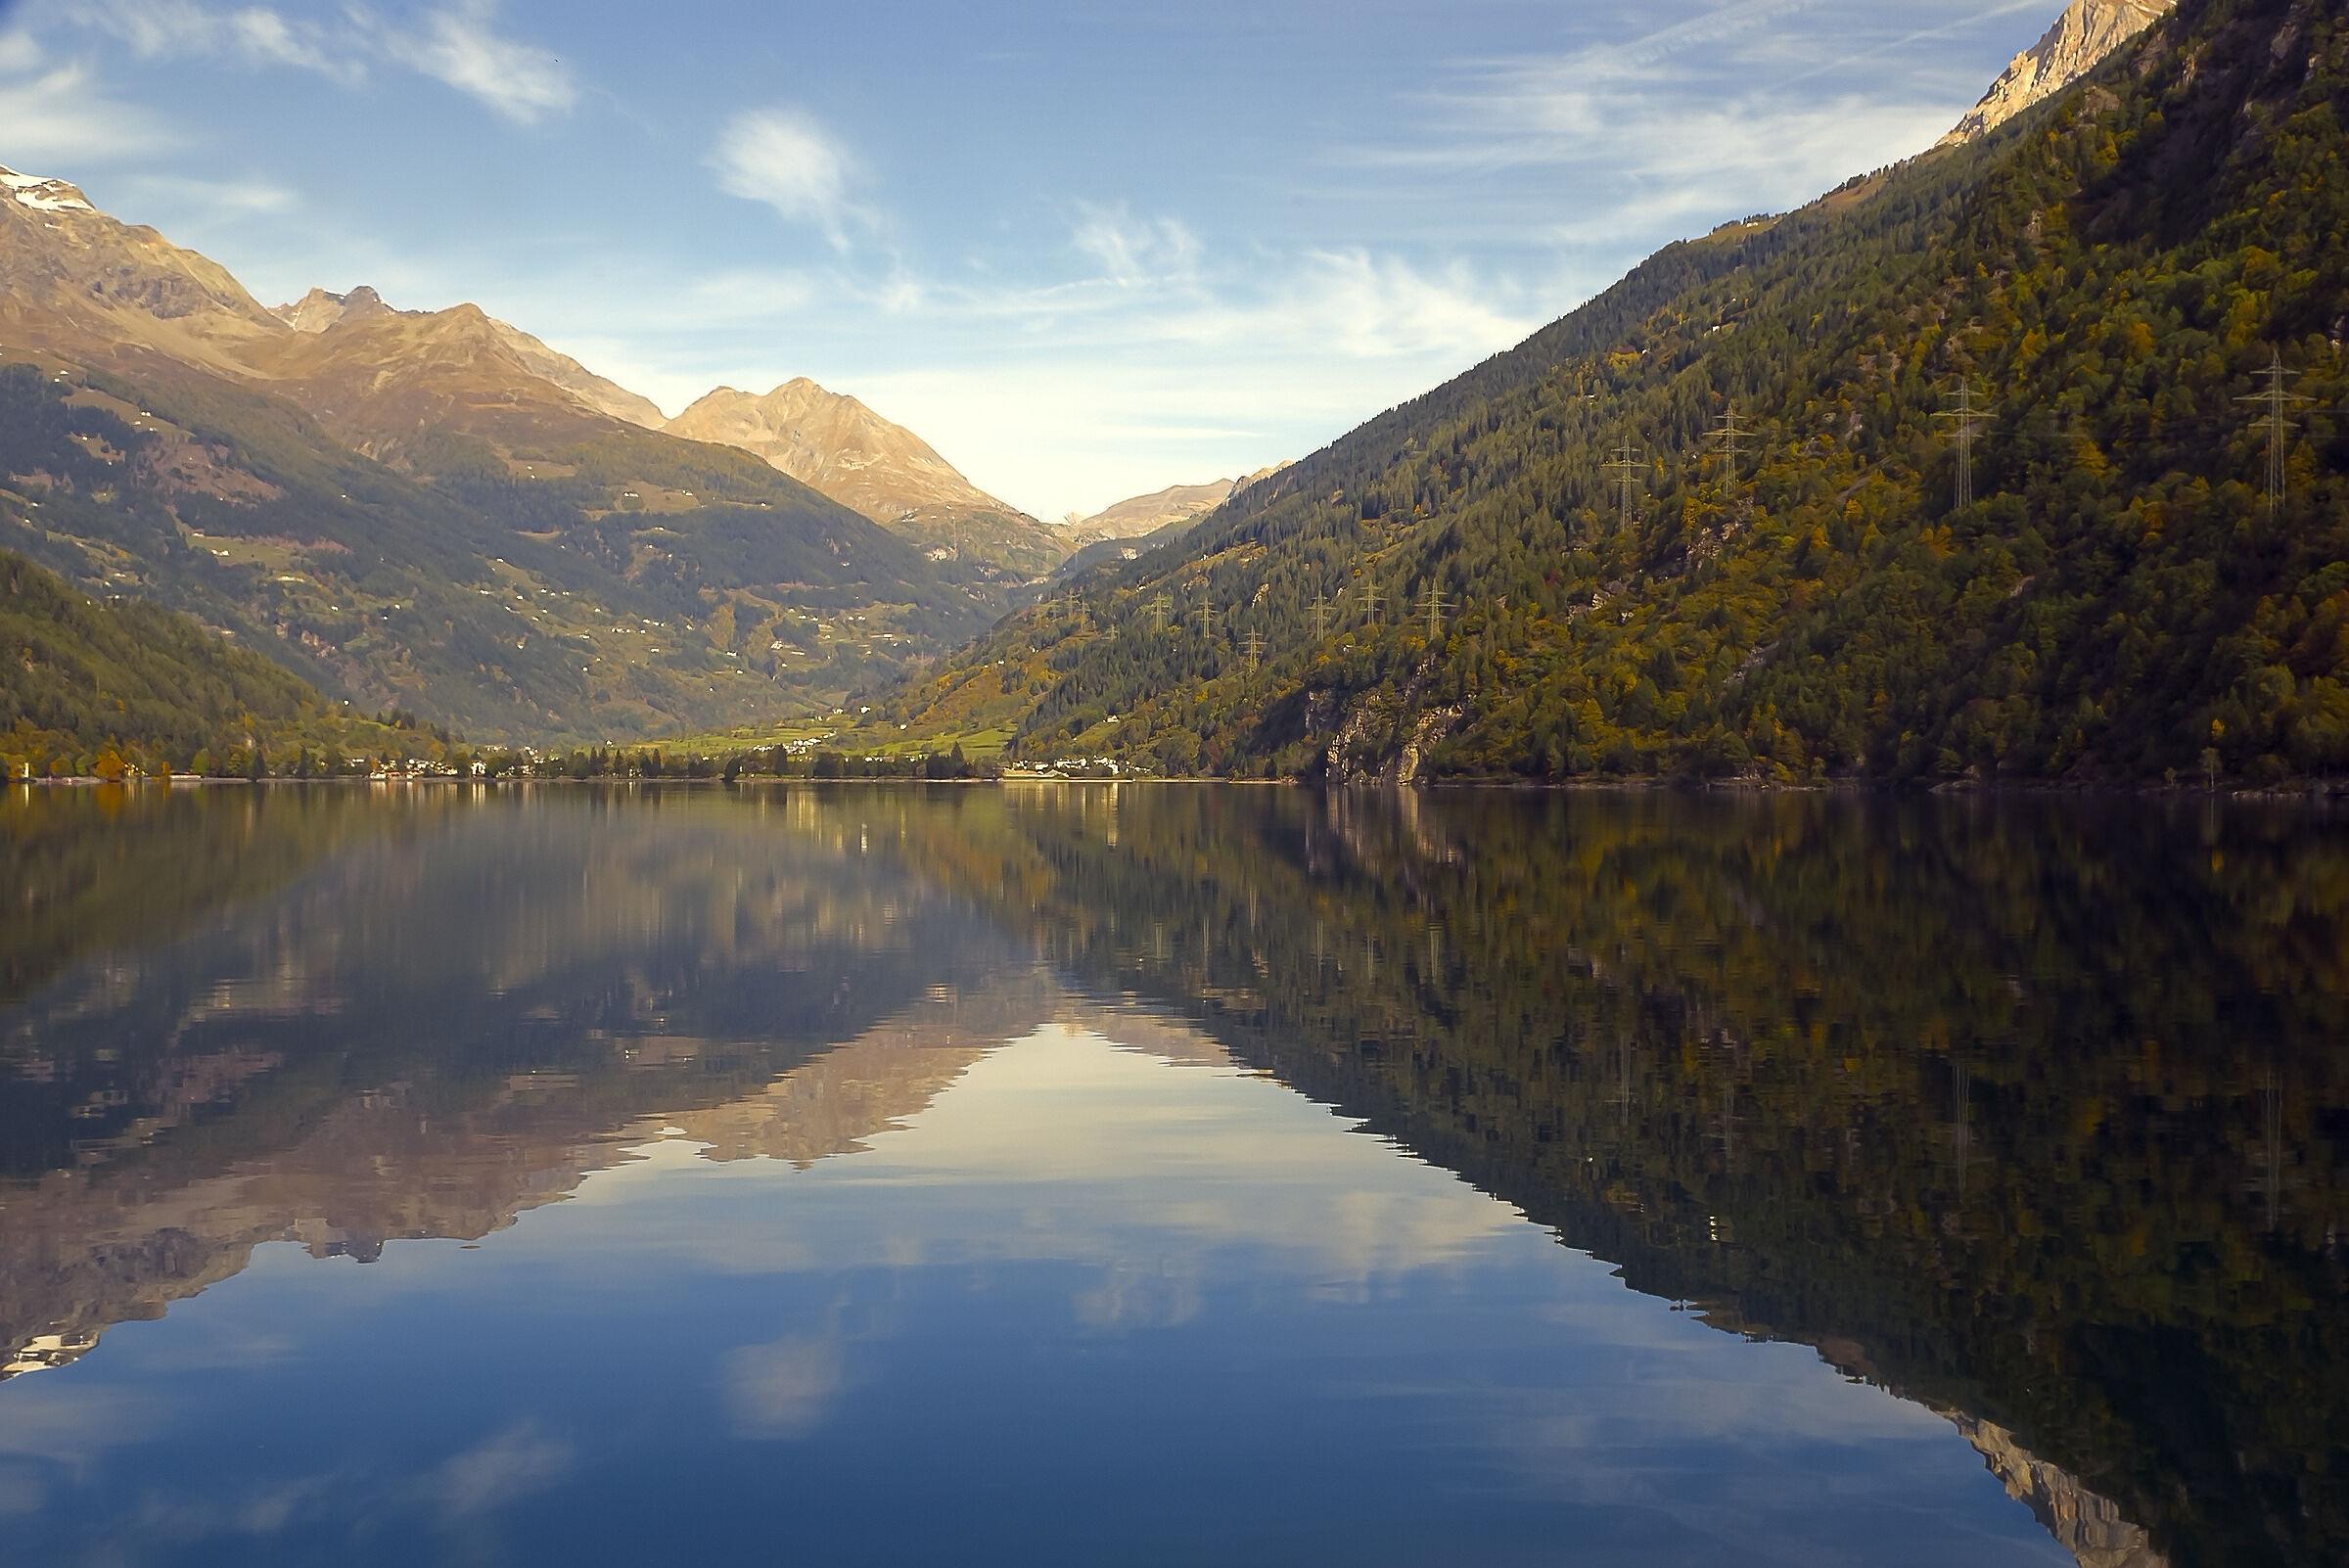 Reflections on Lake Do Poschiavo (Switzerland)...